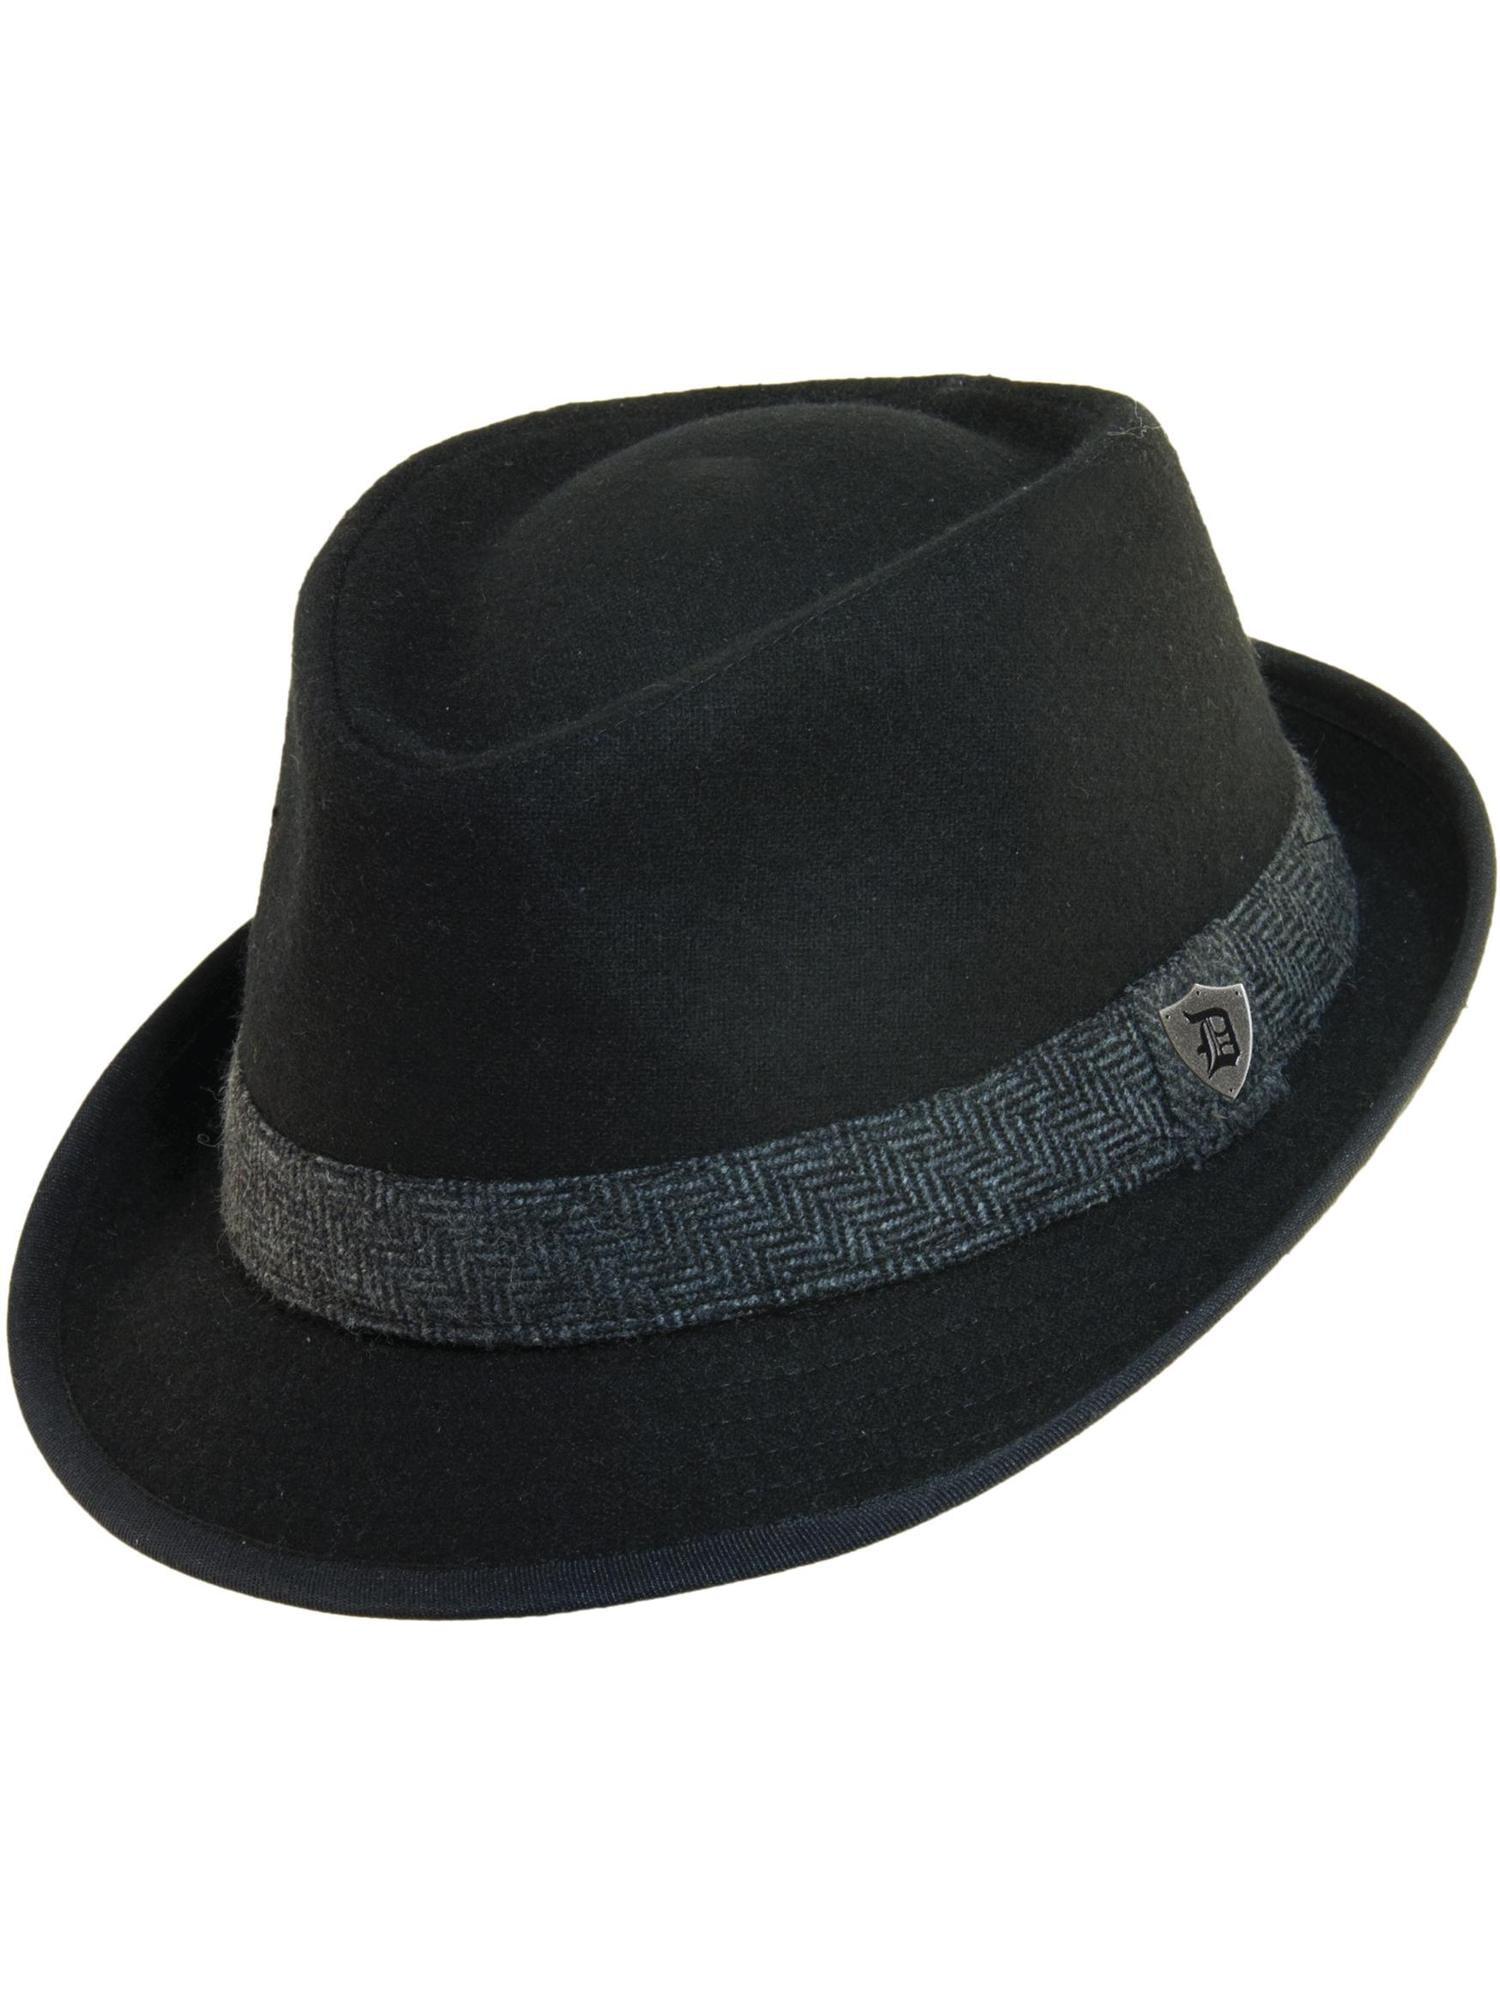 c75664c56ca84 Dorfman Pacific Men s Wool Blend Fedora Hat with Herringbone Band ...